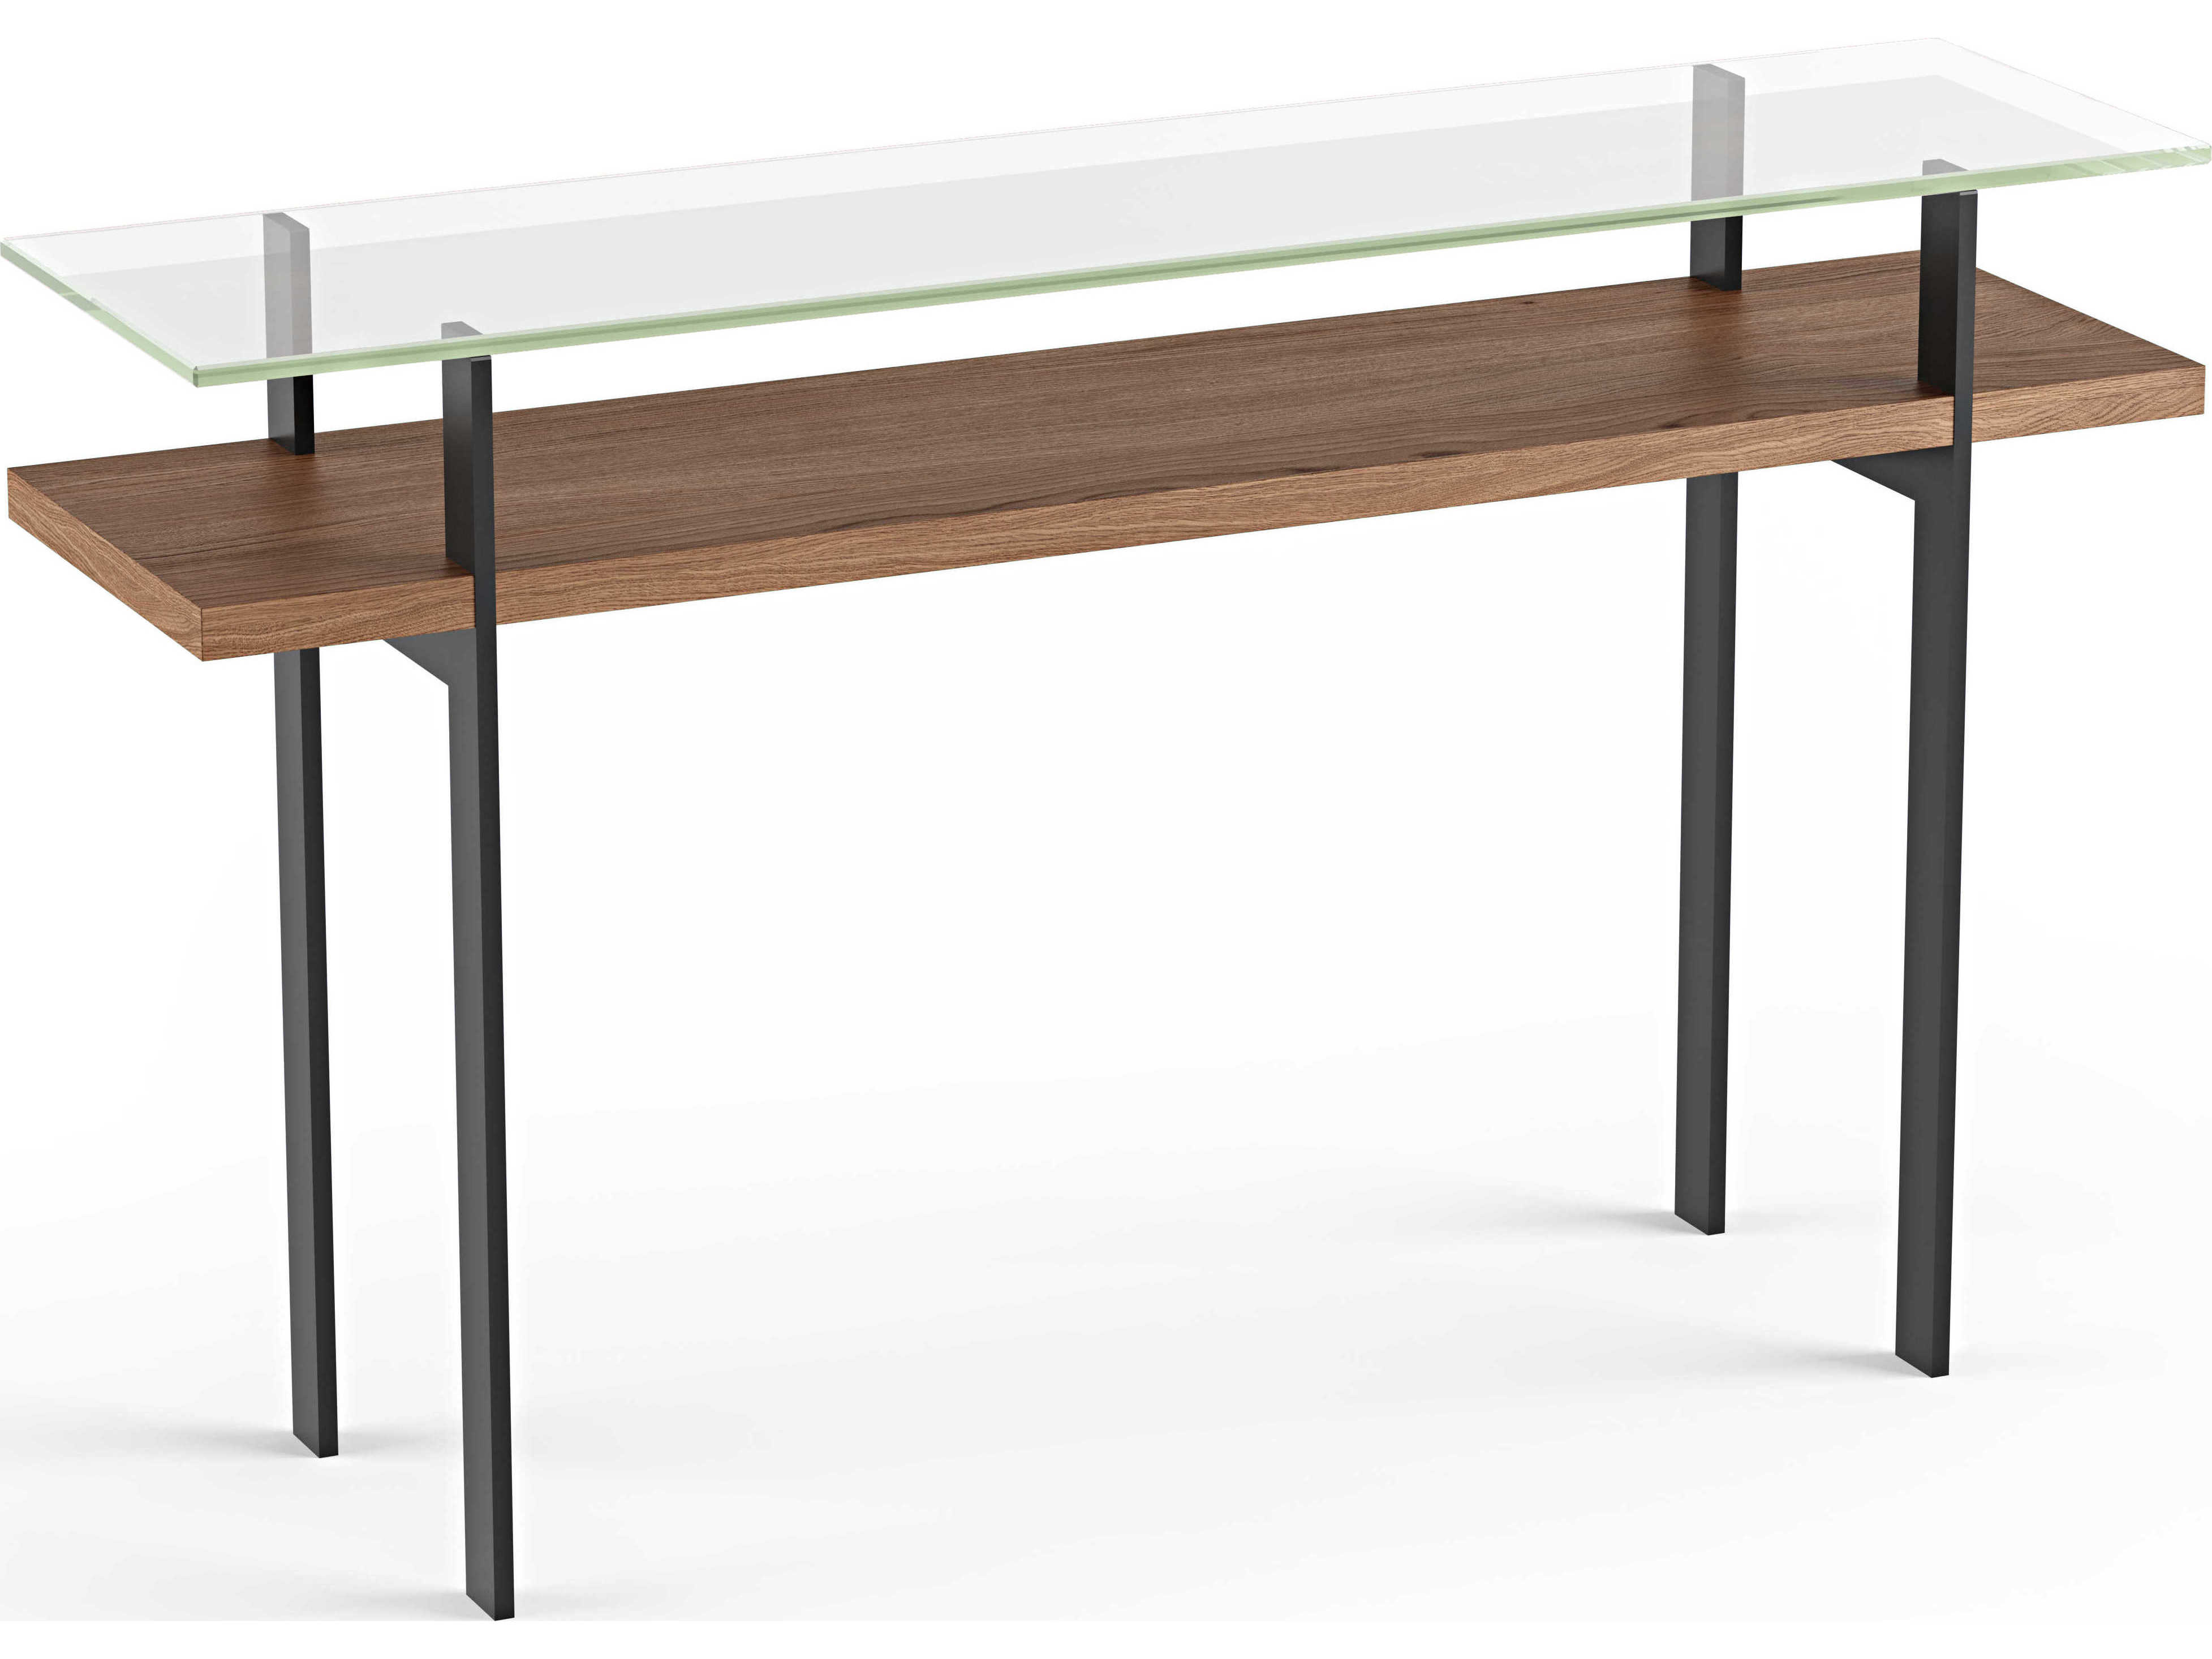 Groovy Bdi Terrace Natural Walnut 50L X 13W Rectangular Console Table Machost Co Dining Chair Design Ideas Machostcouk